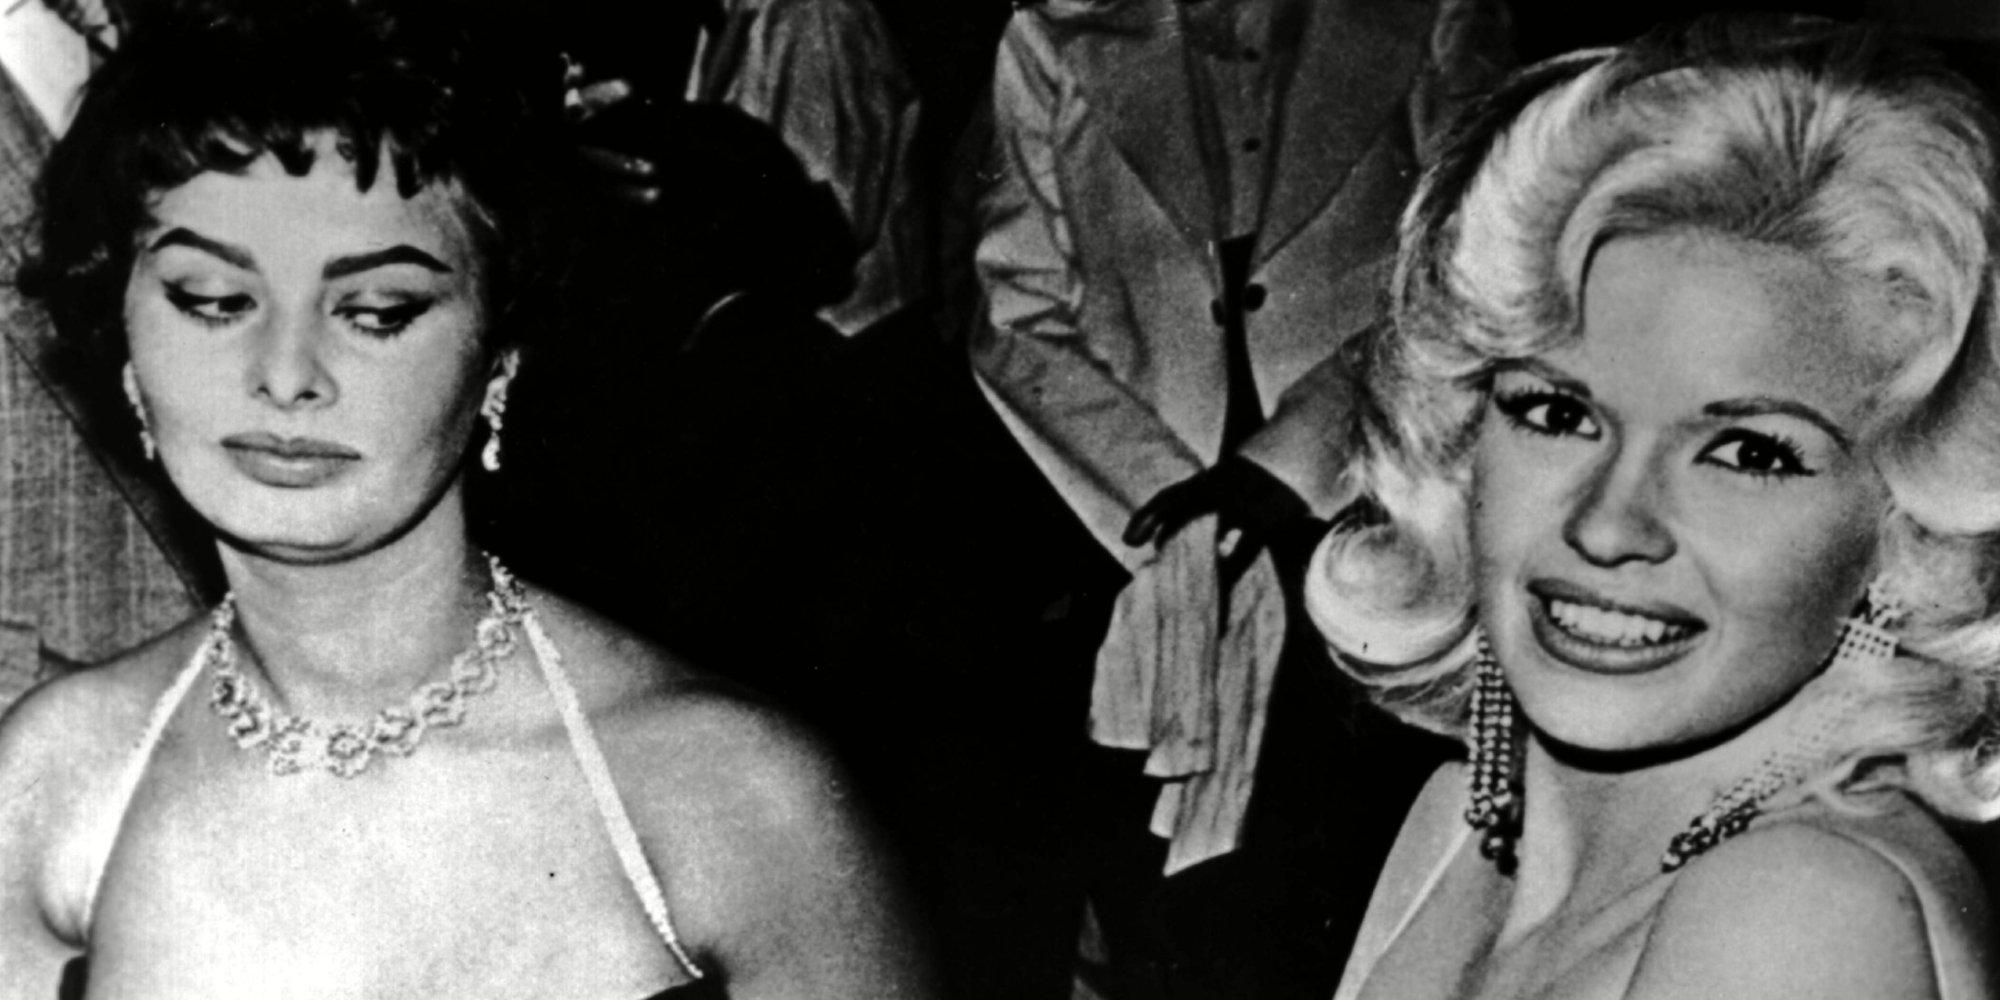 Sophia Loren Explains Jayne Mansfield 'Side-Eye' Photo ...